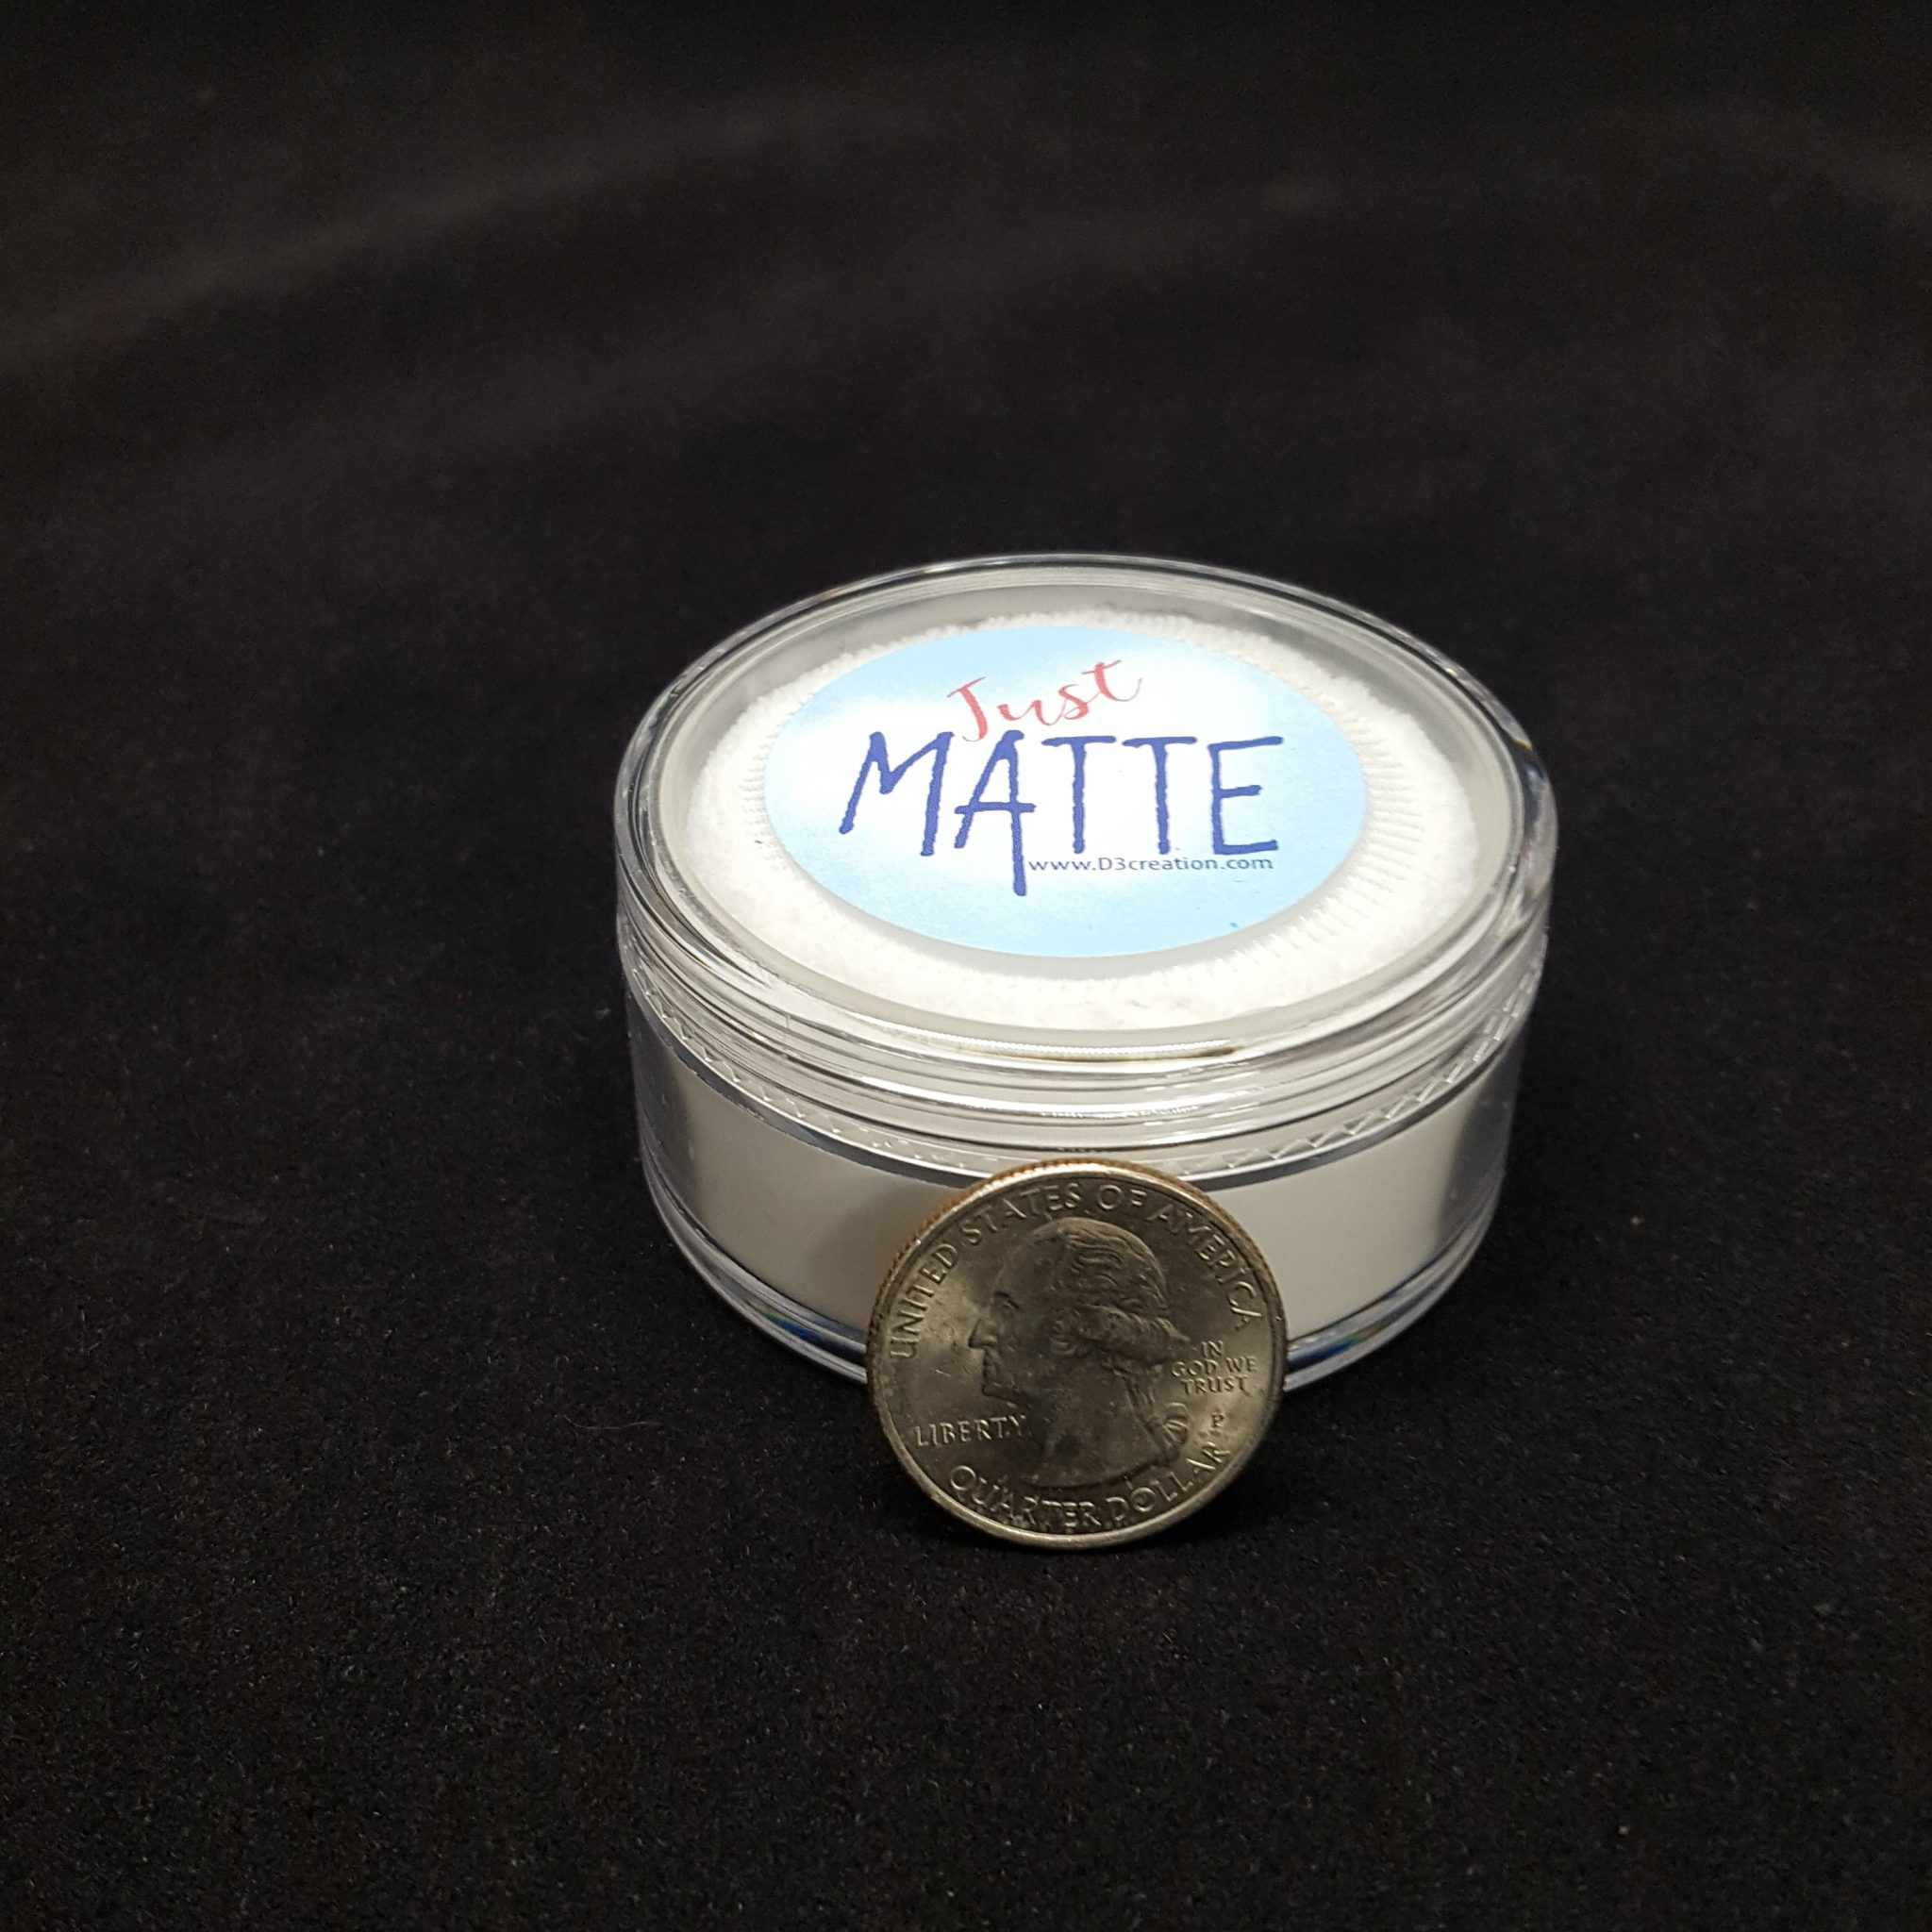 15g Sifter Jar matting powder for silicone